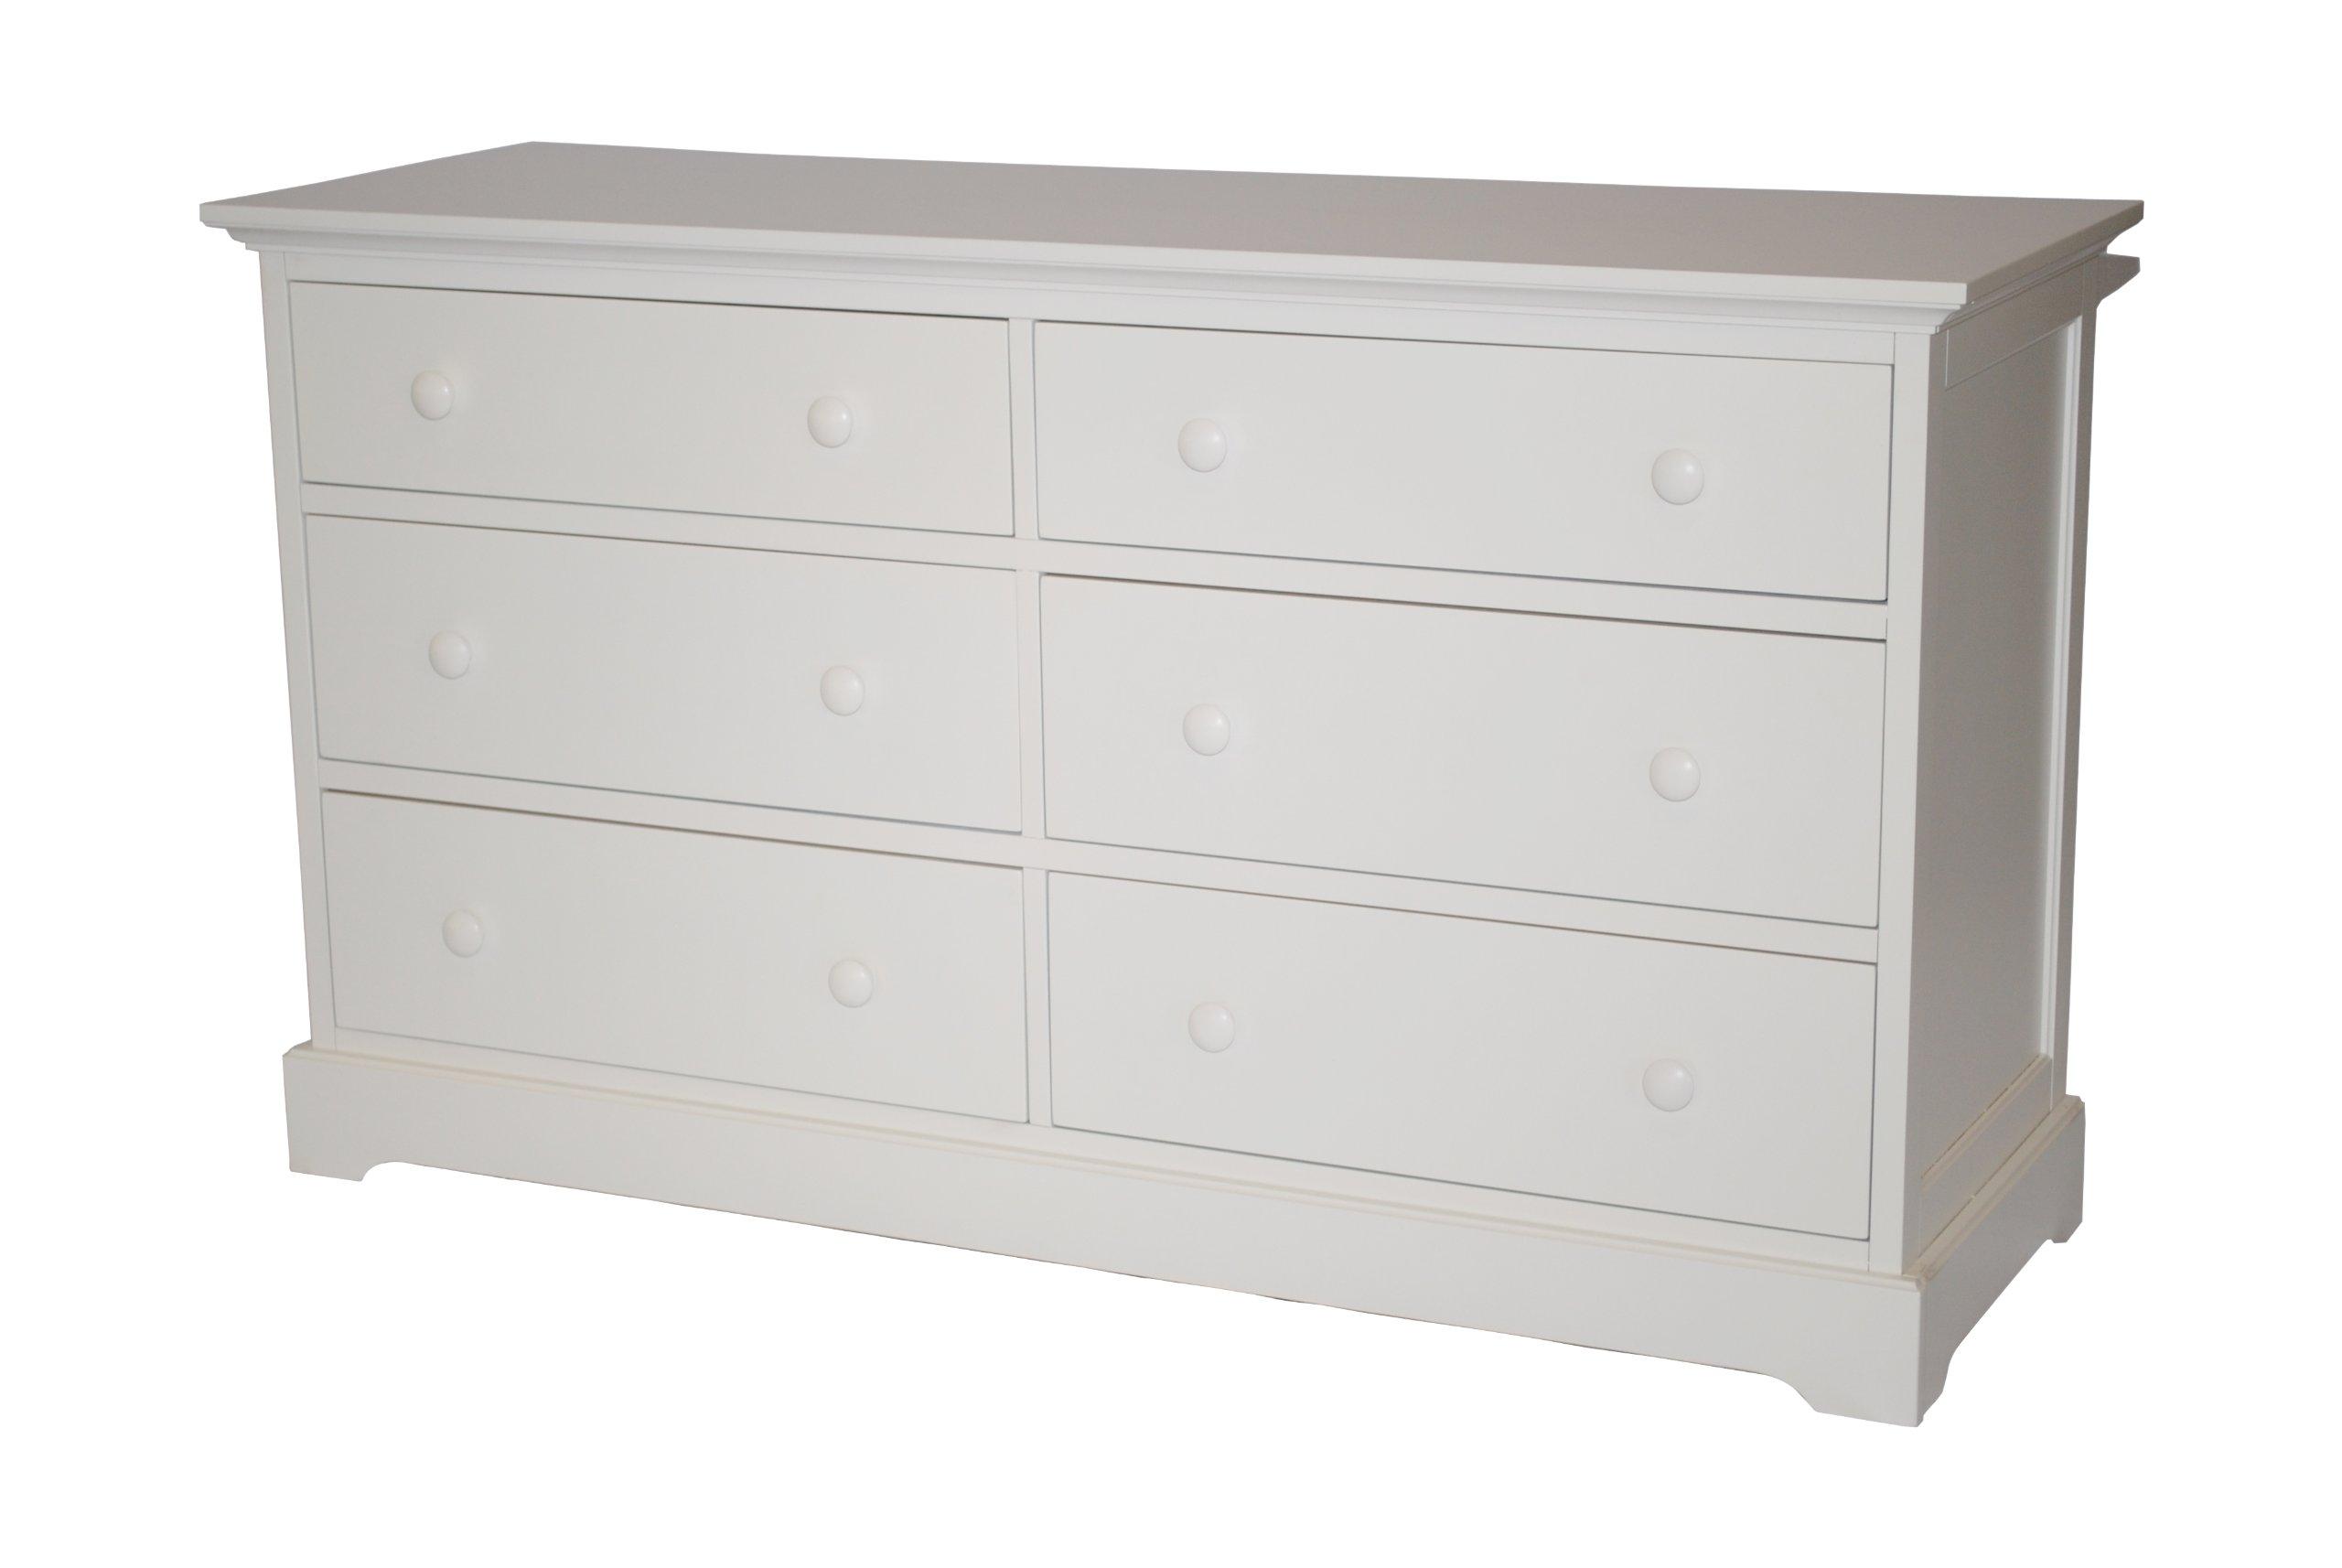 Munire Chesapeake Double Dresser - White